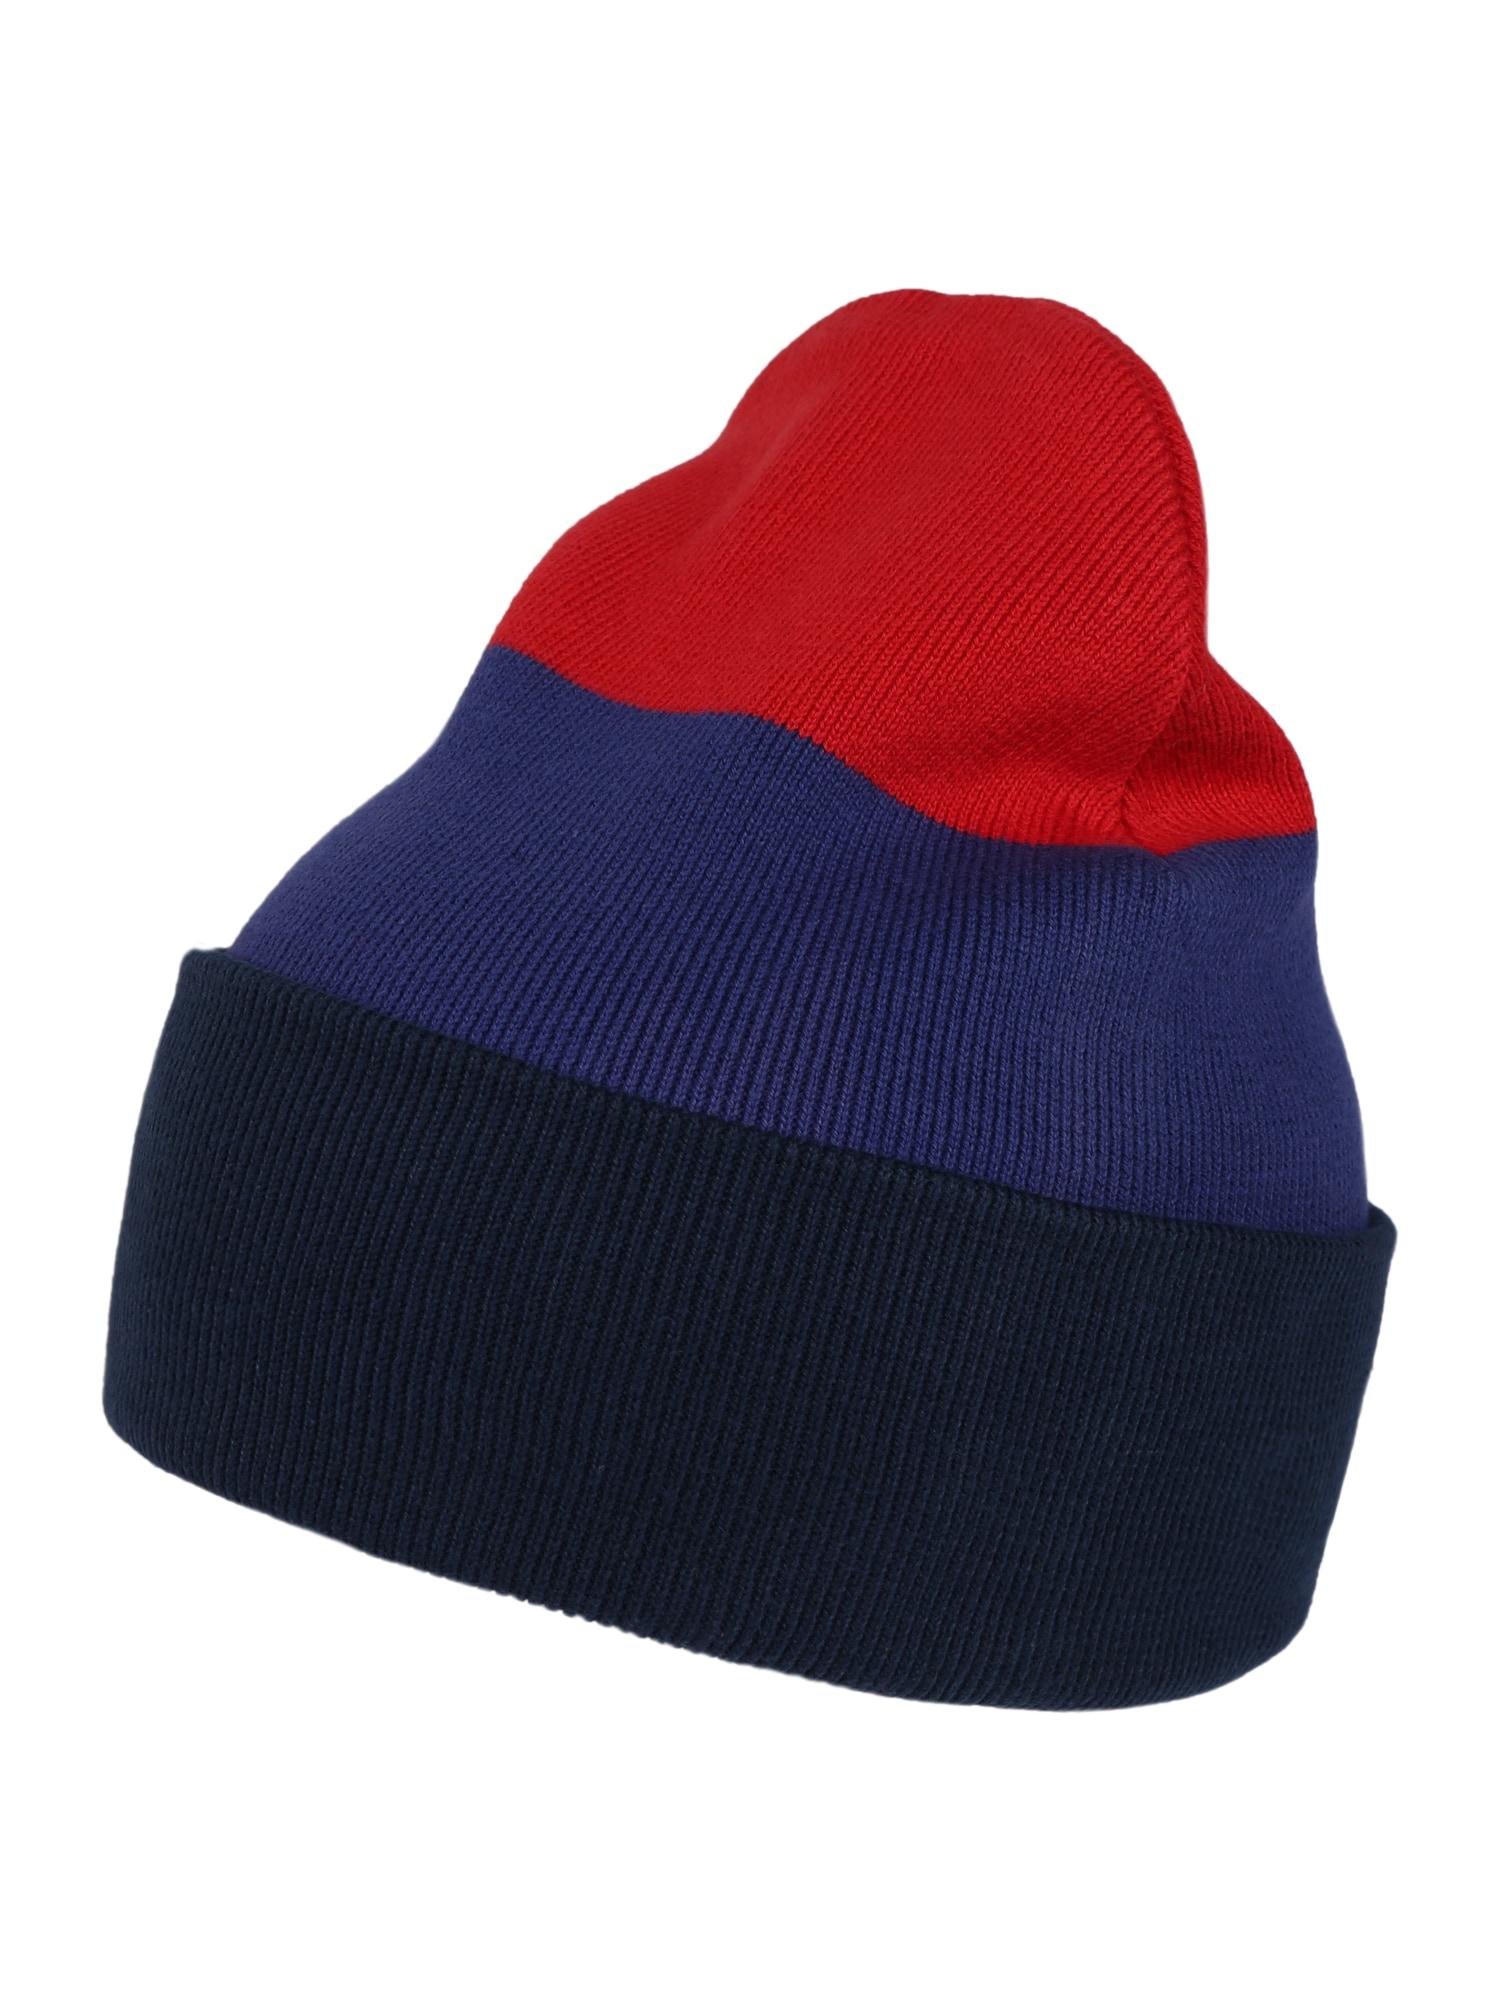 ThokkThokk Megzta kepurė tamsiai mėlyna / raudona / mėlyna